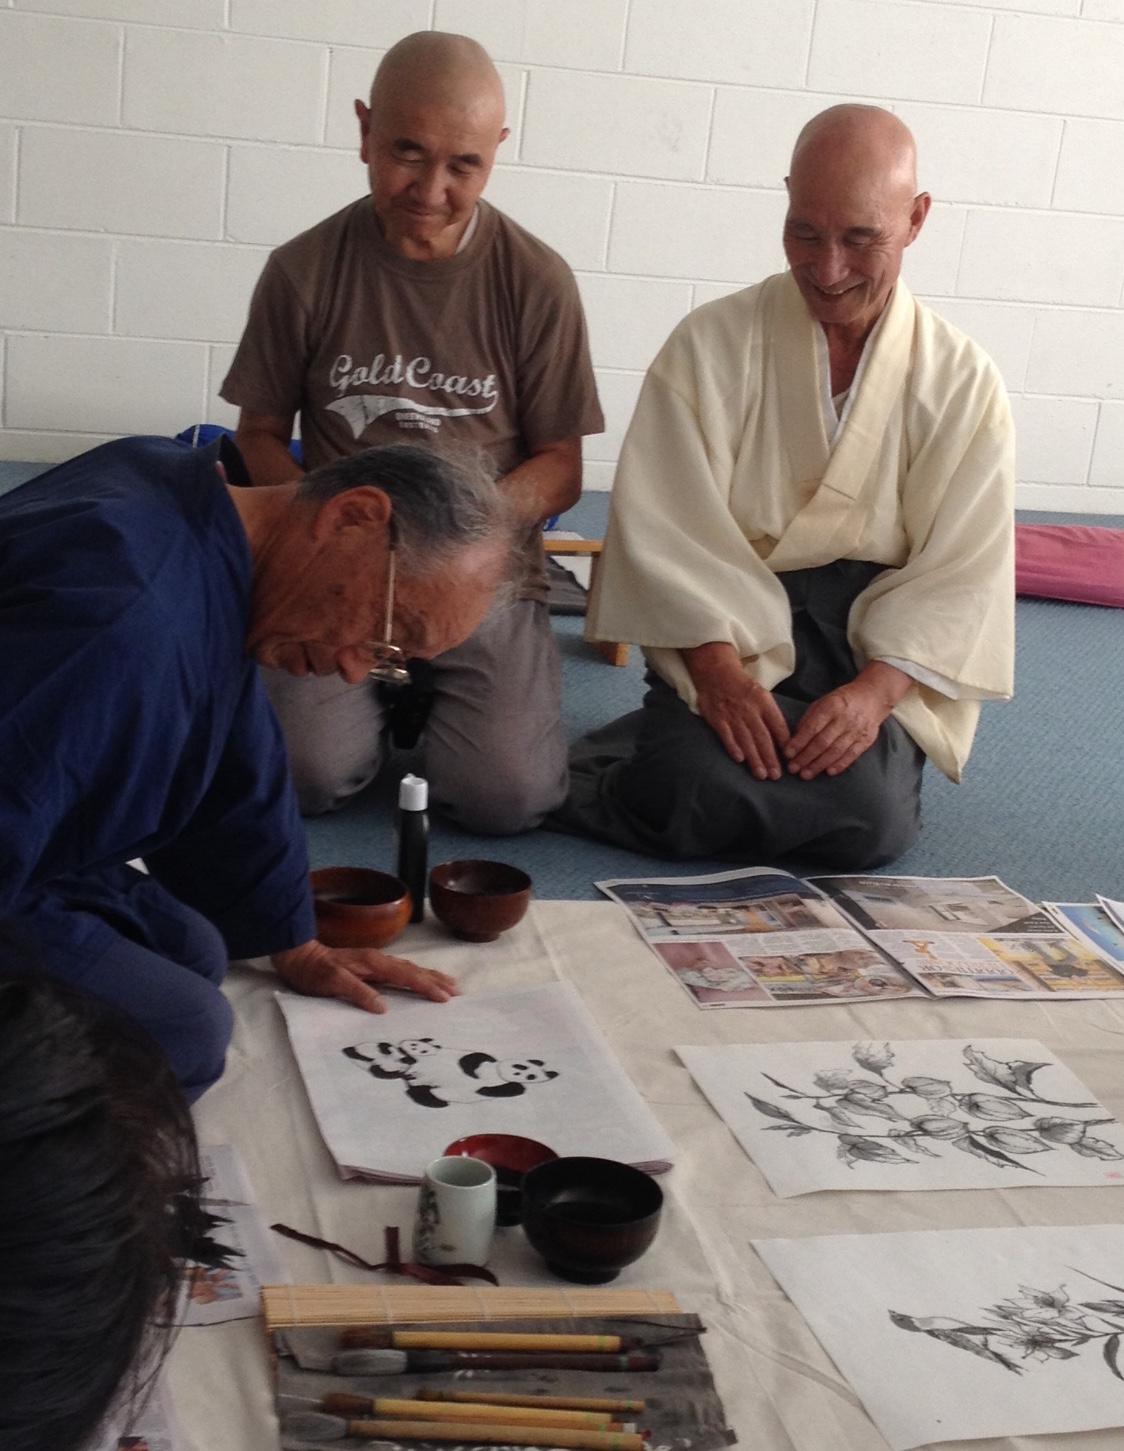 Sumie workshop with Kawaku-san teaching us while Teshin-san (L) and Jinen-san (R) look on.